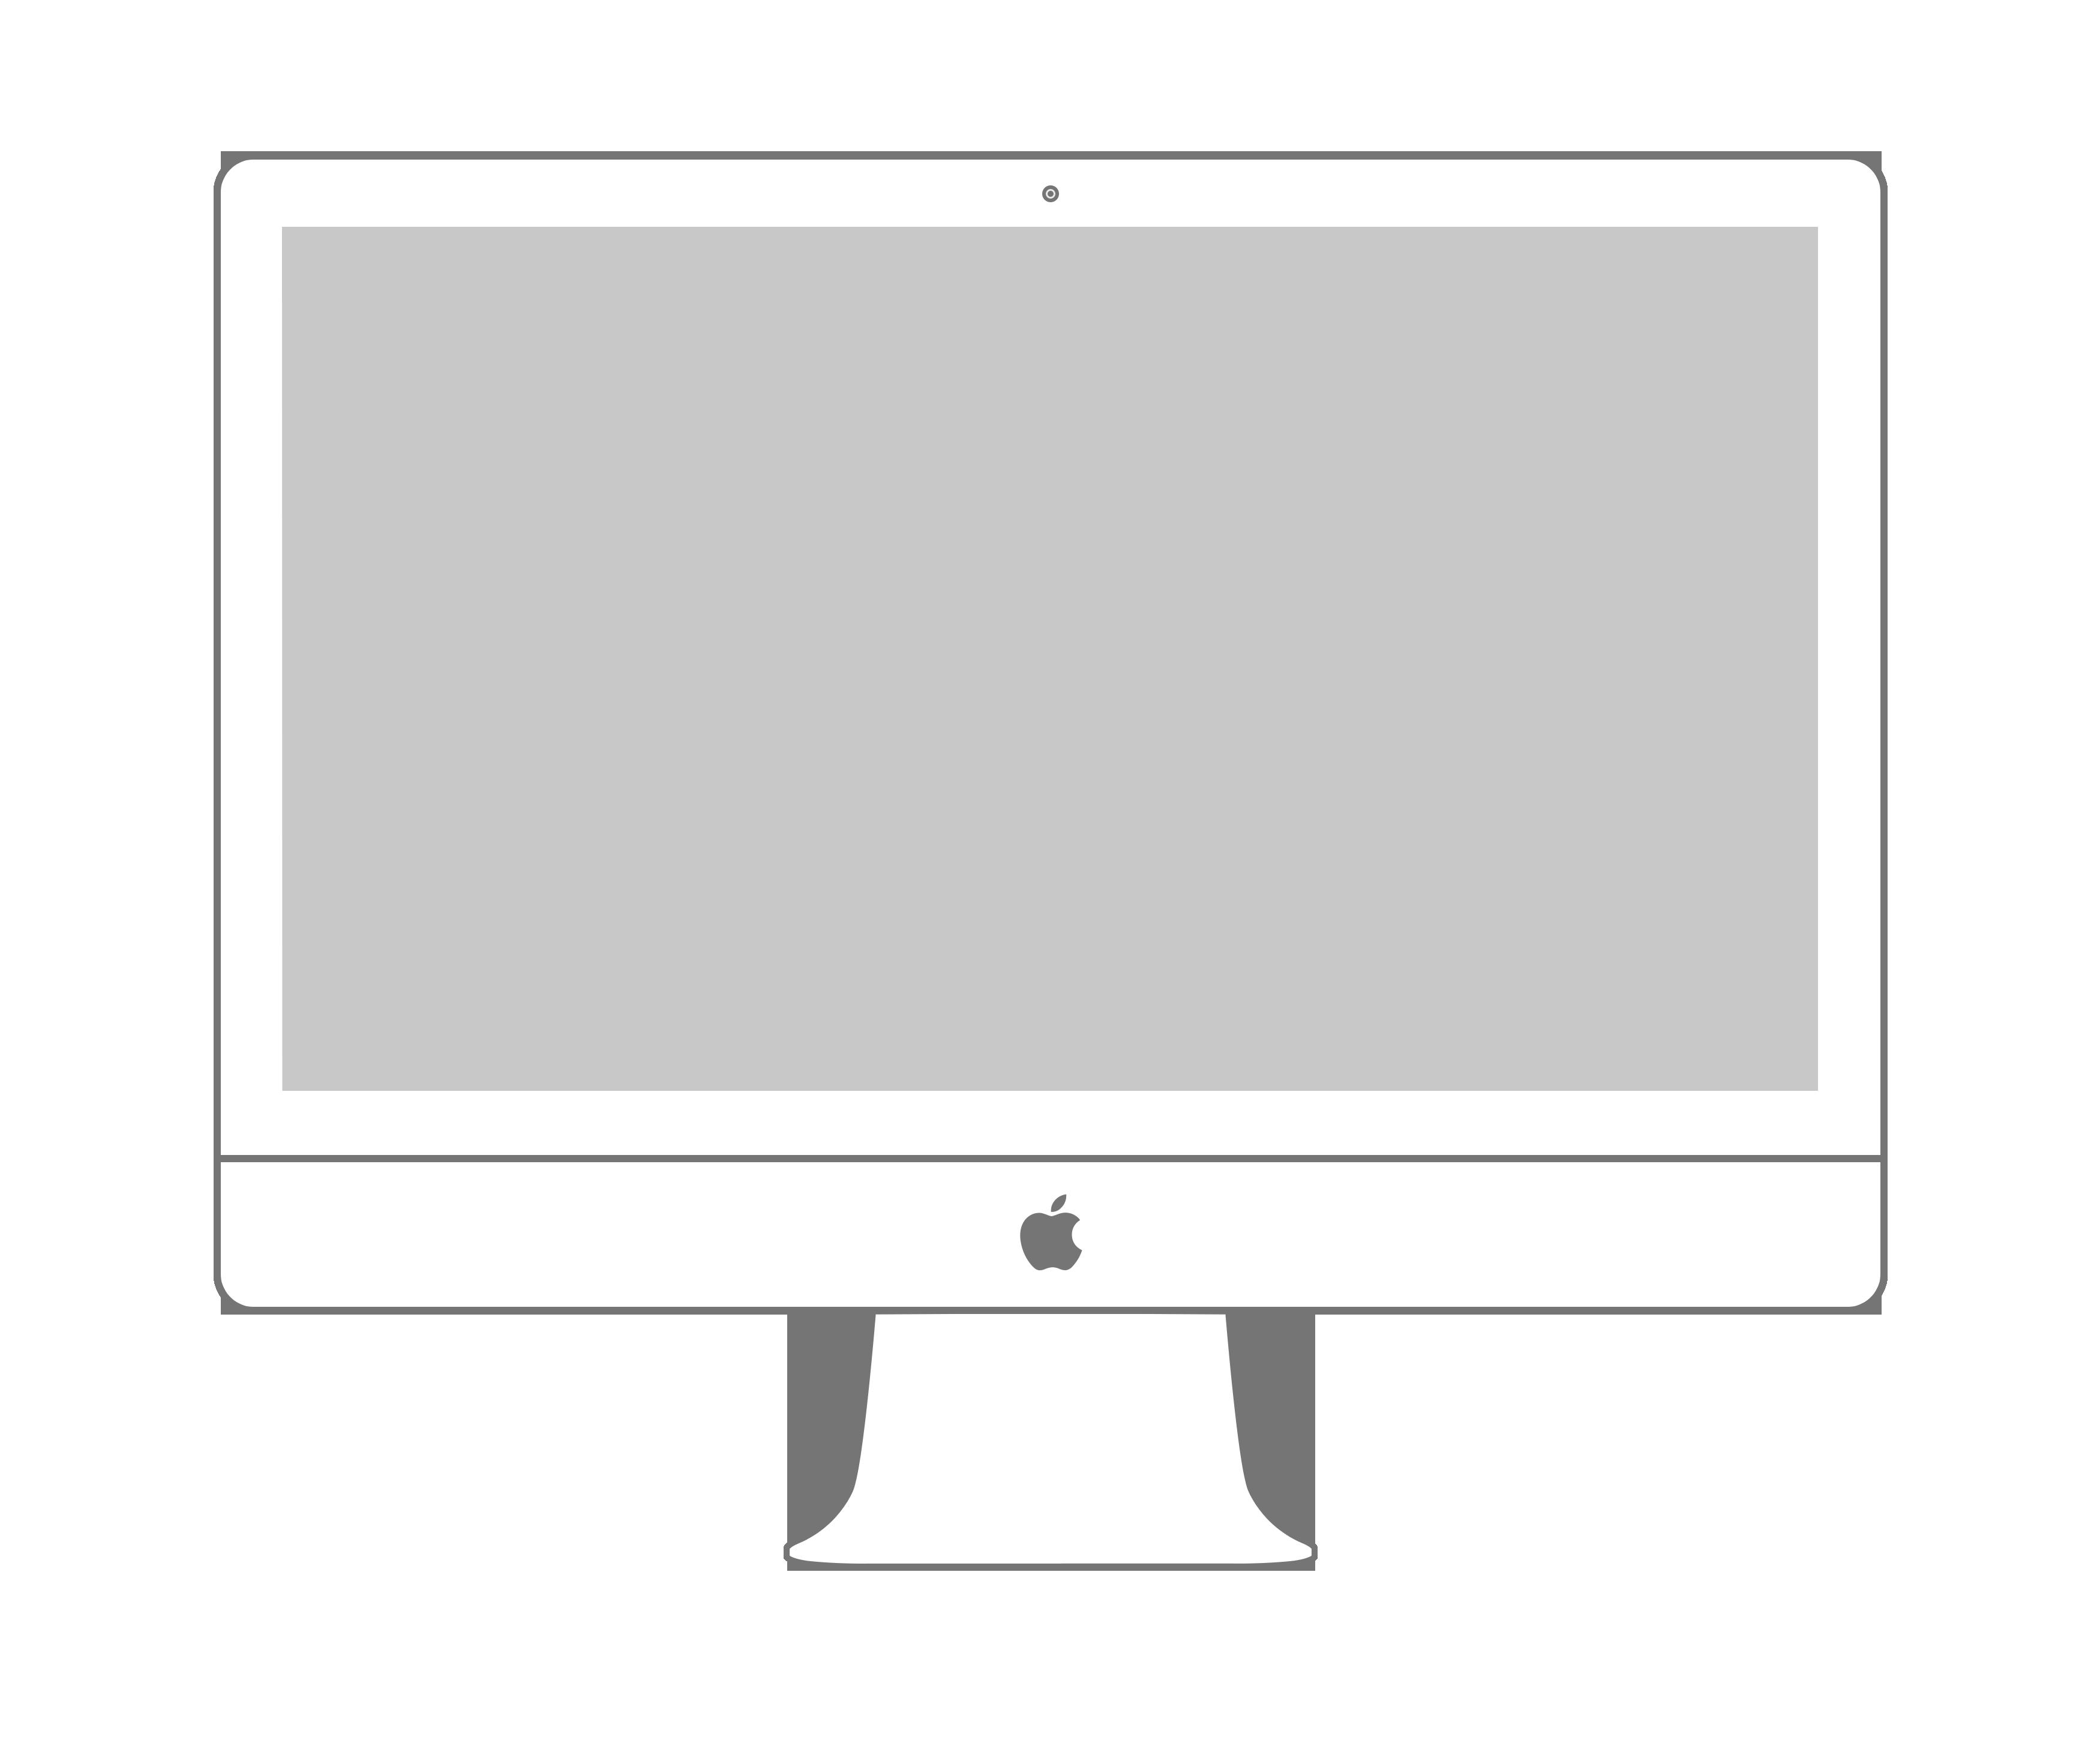 imac template sketched - Google Search | web & ui design | Pinterest